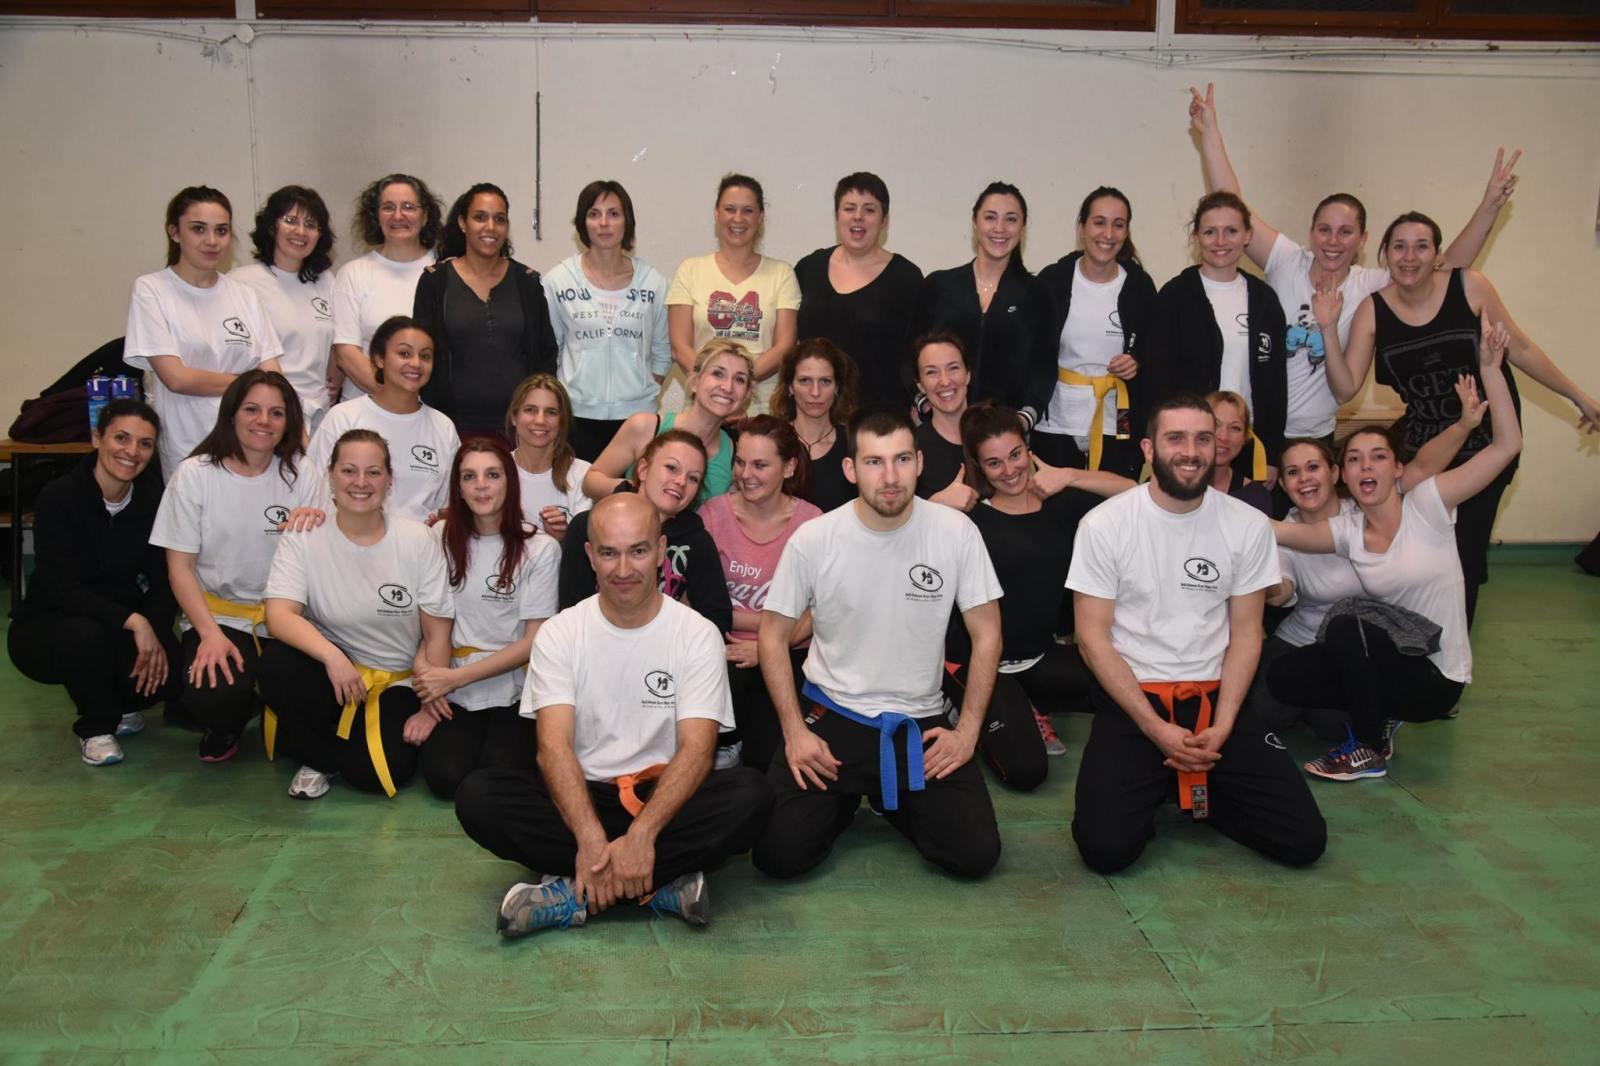 Cours Femmes (13 ans et +) - Self-Defense Krav Maga Area (SDKM AREA)